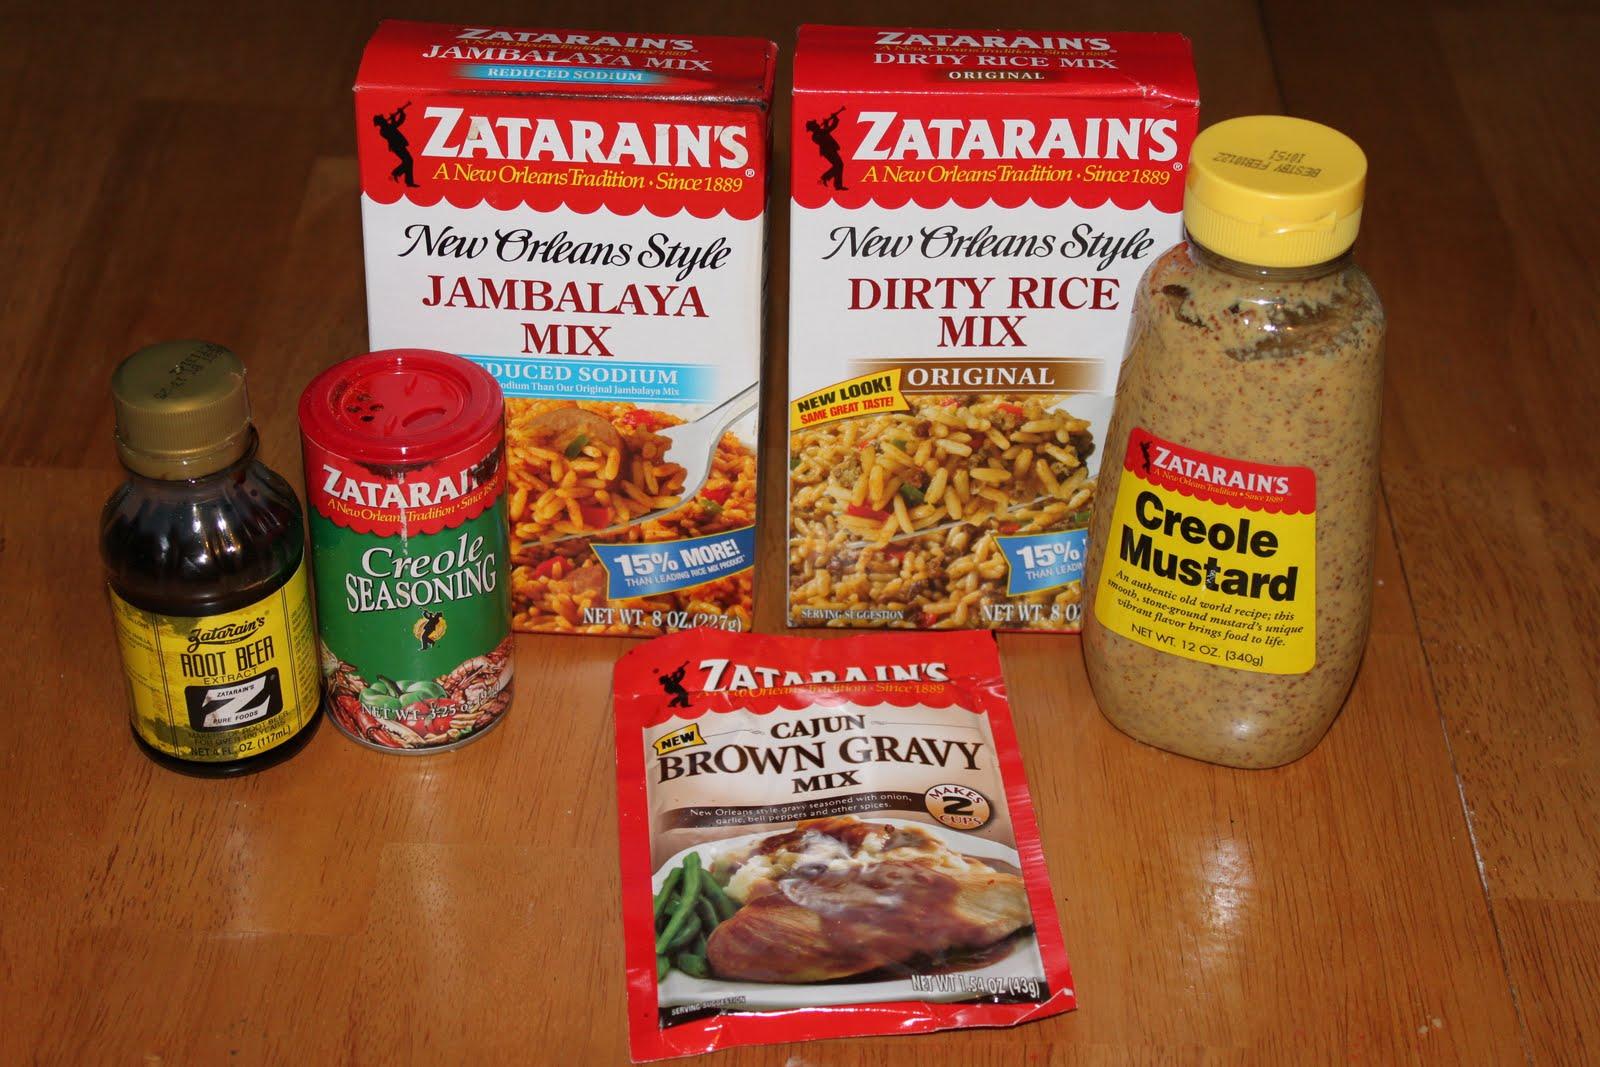 ... Jambalaya Mix Zatarain's Dirty Rice Mix Zatarain's Cajun brown gravy